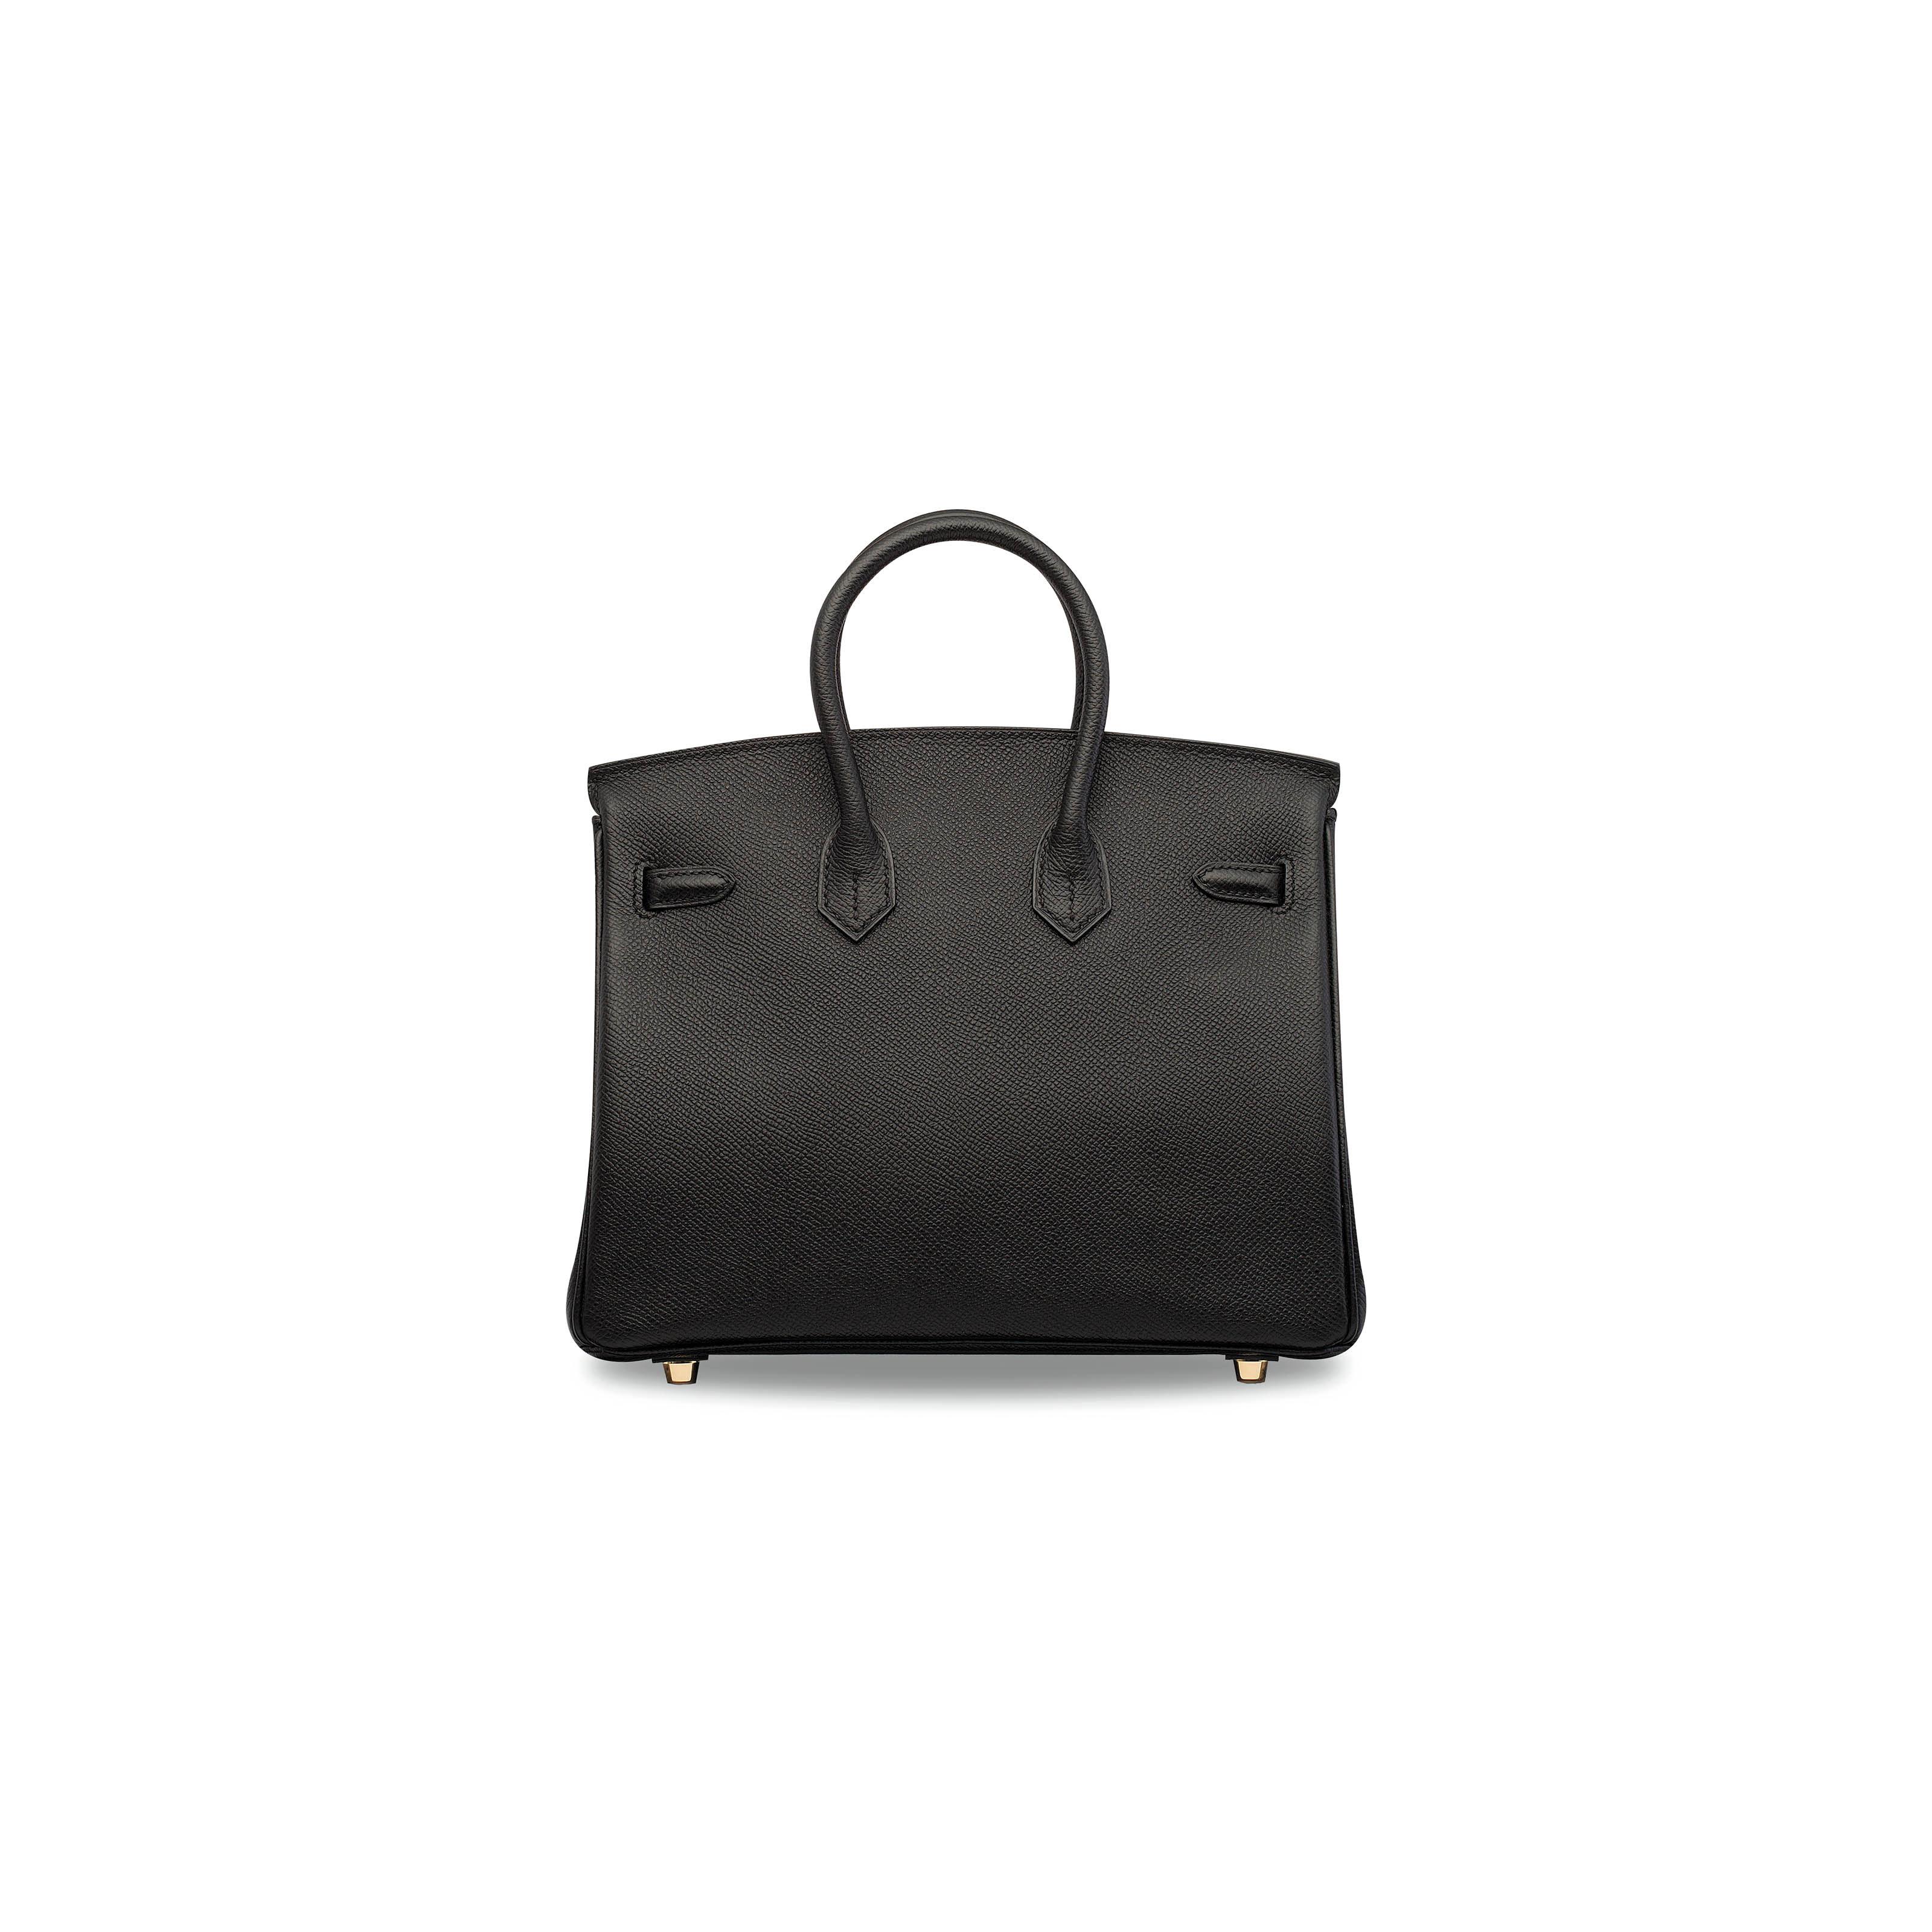 482f4b557c71 ... best price a black epsom leather birkin 25 with gold hardware hermÈs  2016 c1756 80ad6